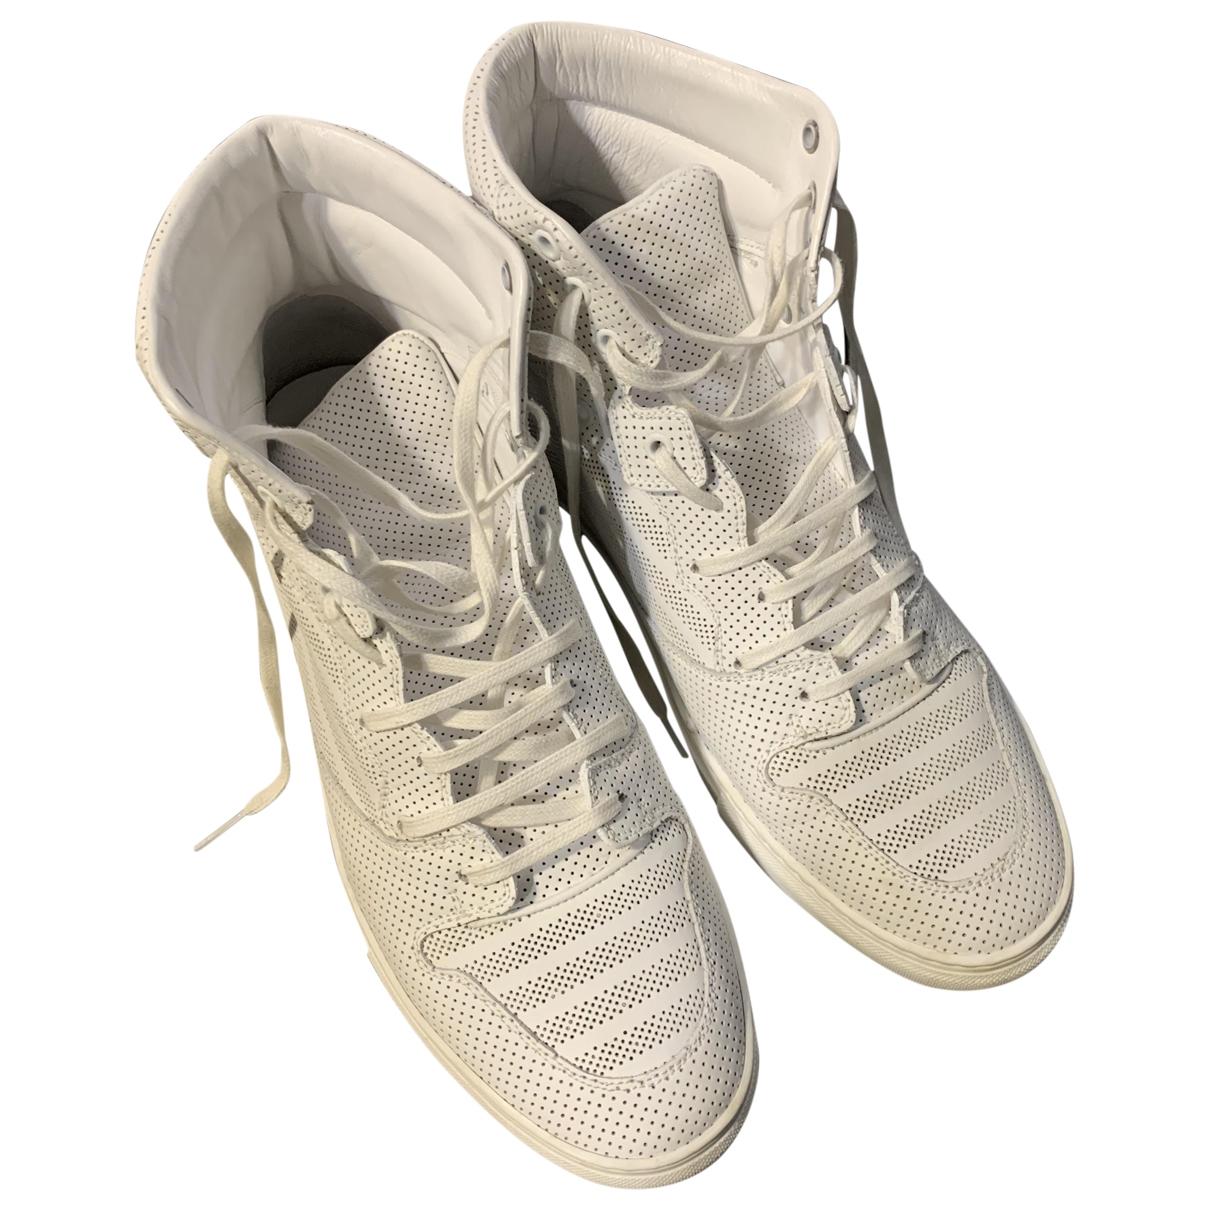 Balenciaga - Baskets   pour homme en cuir verni - blanc